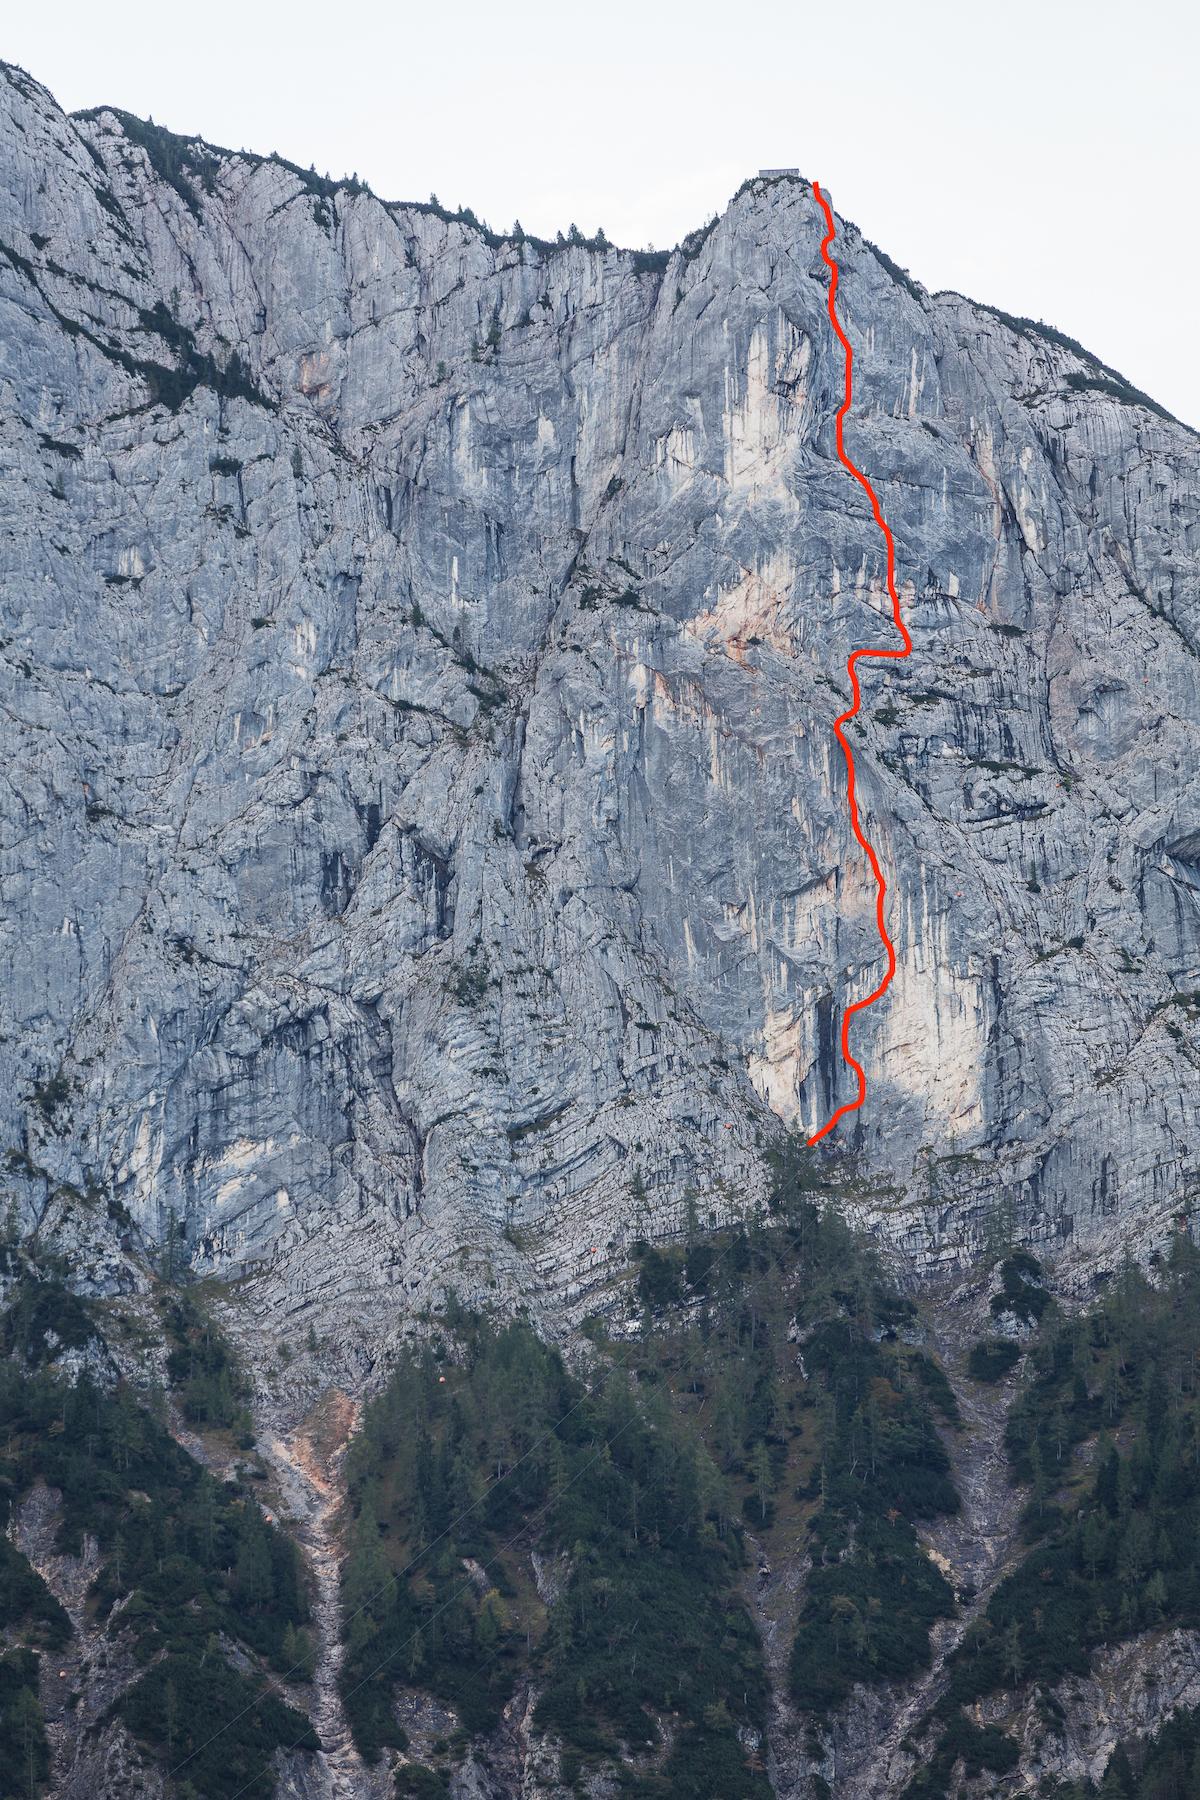 The line of Wolke 7 (aka Cloud 9: 5.13b, 12 pitches, 380m), on the Hinteres Feuerhorndl, Reiteralm, Austria. [Photo] Klaus Fengler